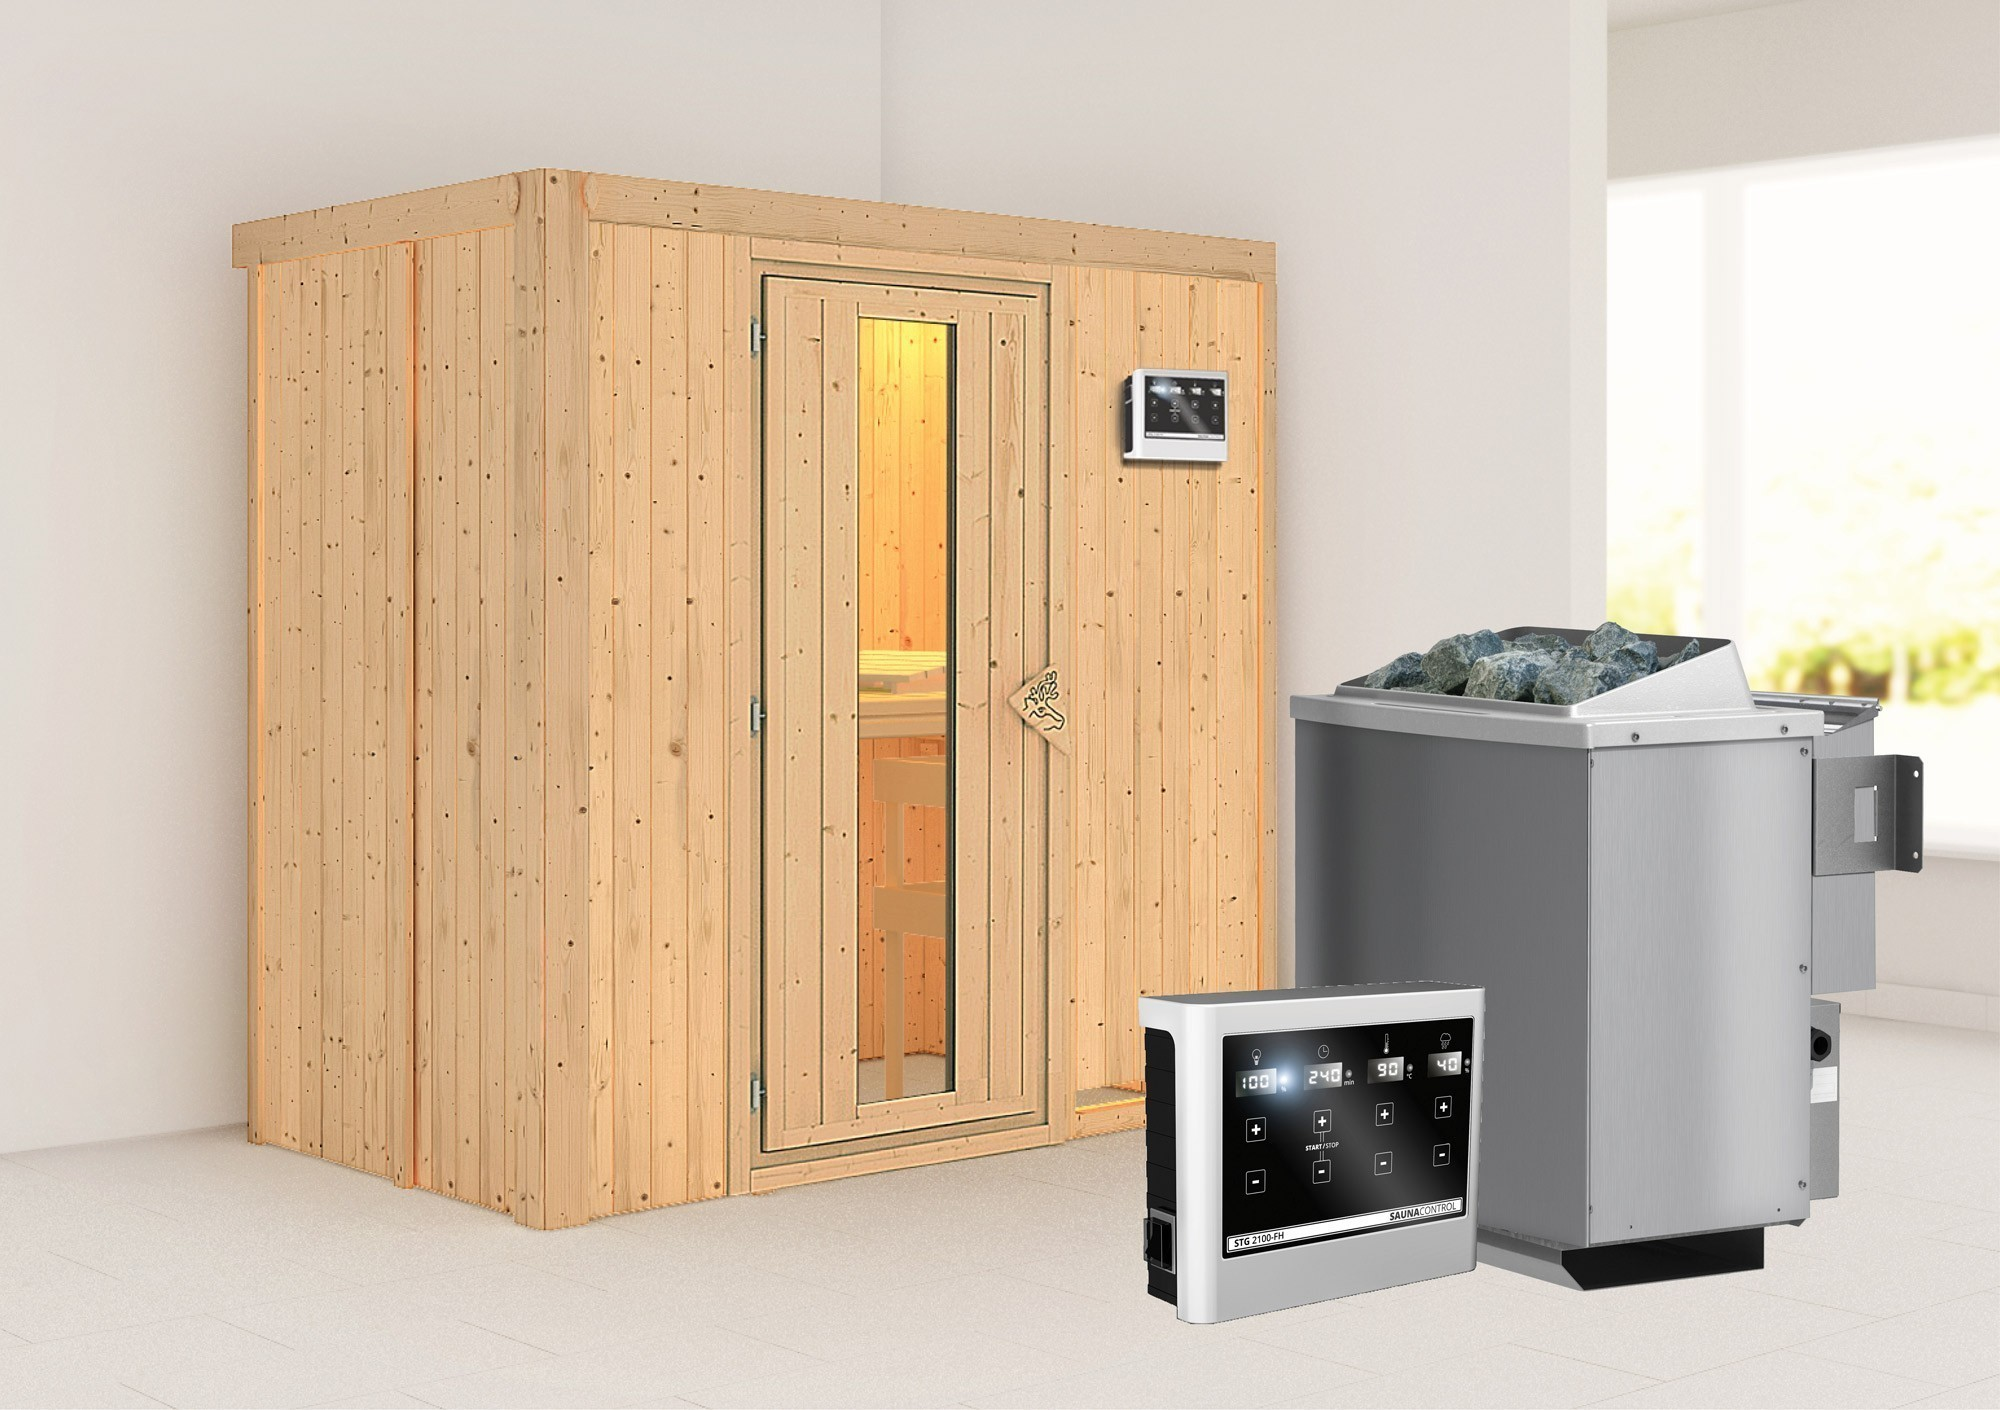 Karibu Sauna Variado 68mm mit Bio Saunaofen 9kW extern Holztür Bild 1